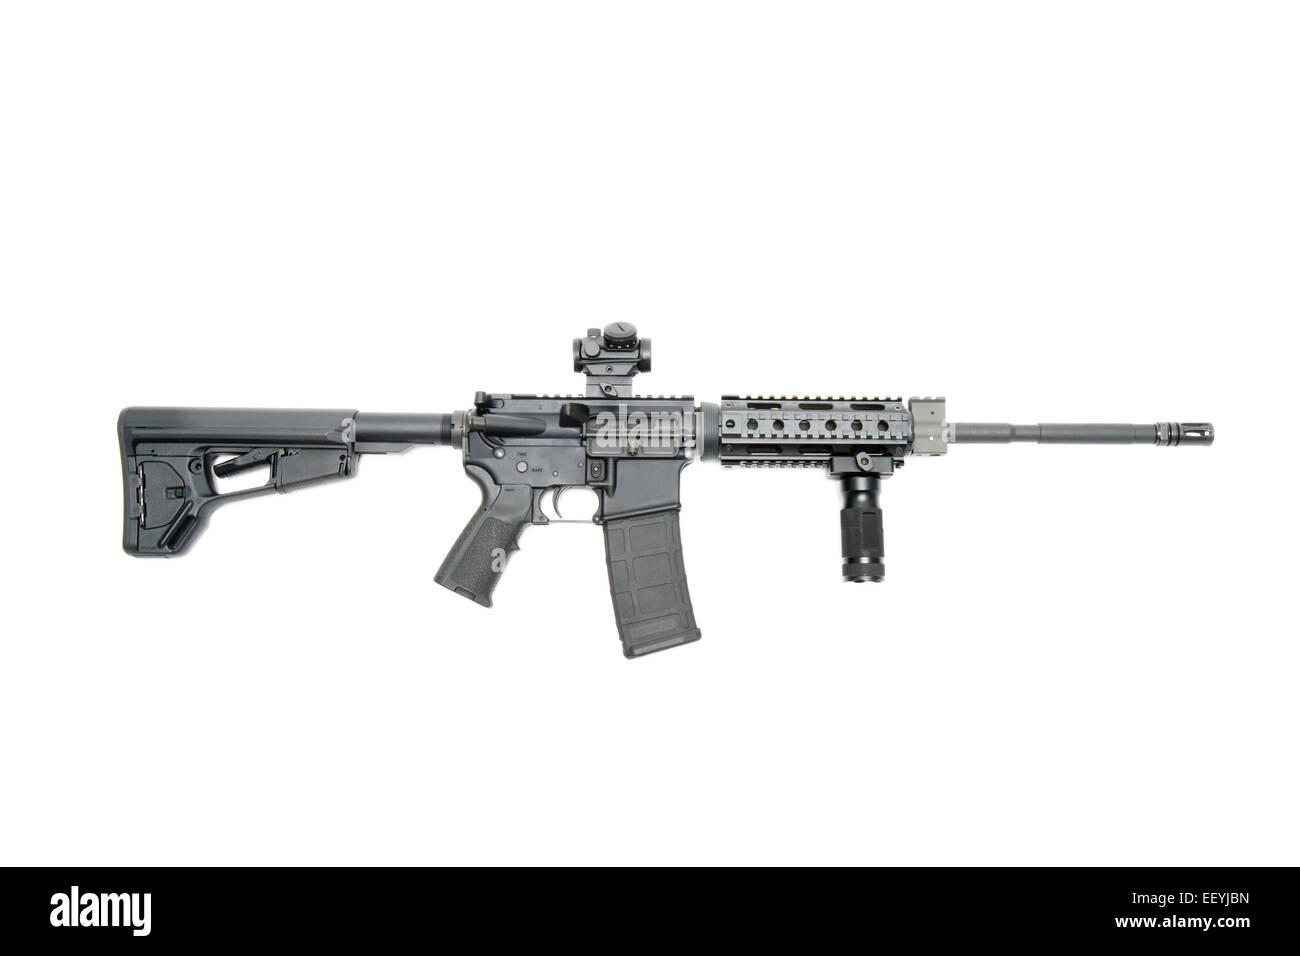 Carabine tactique AR15 Photo Stock